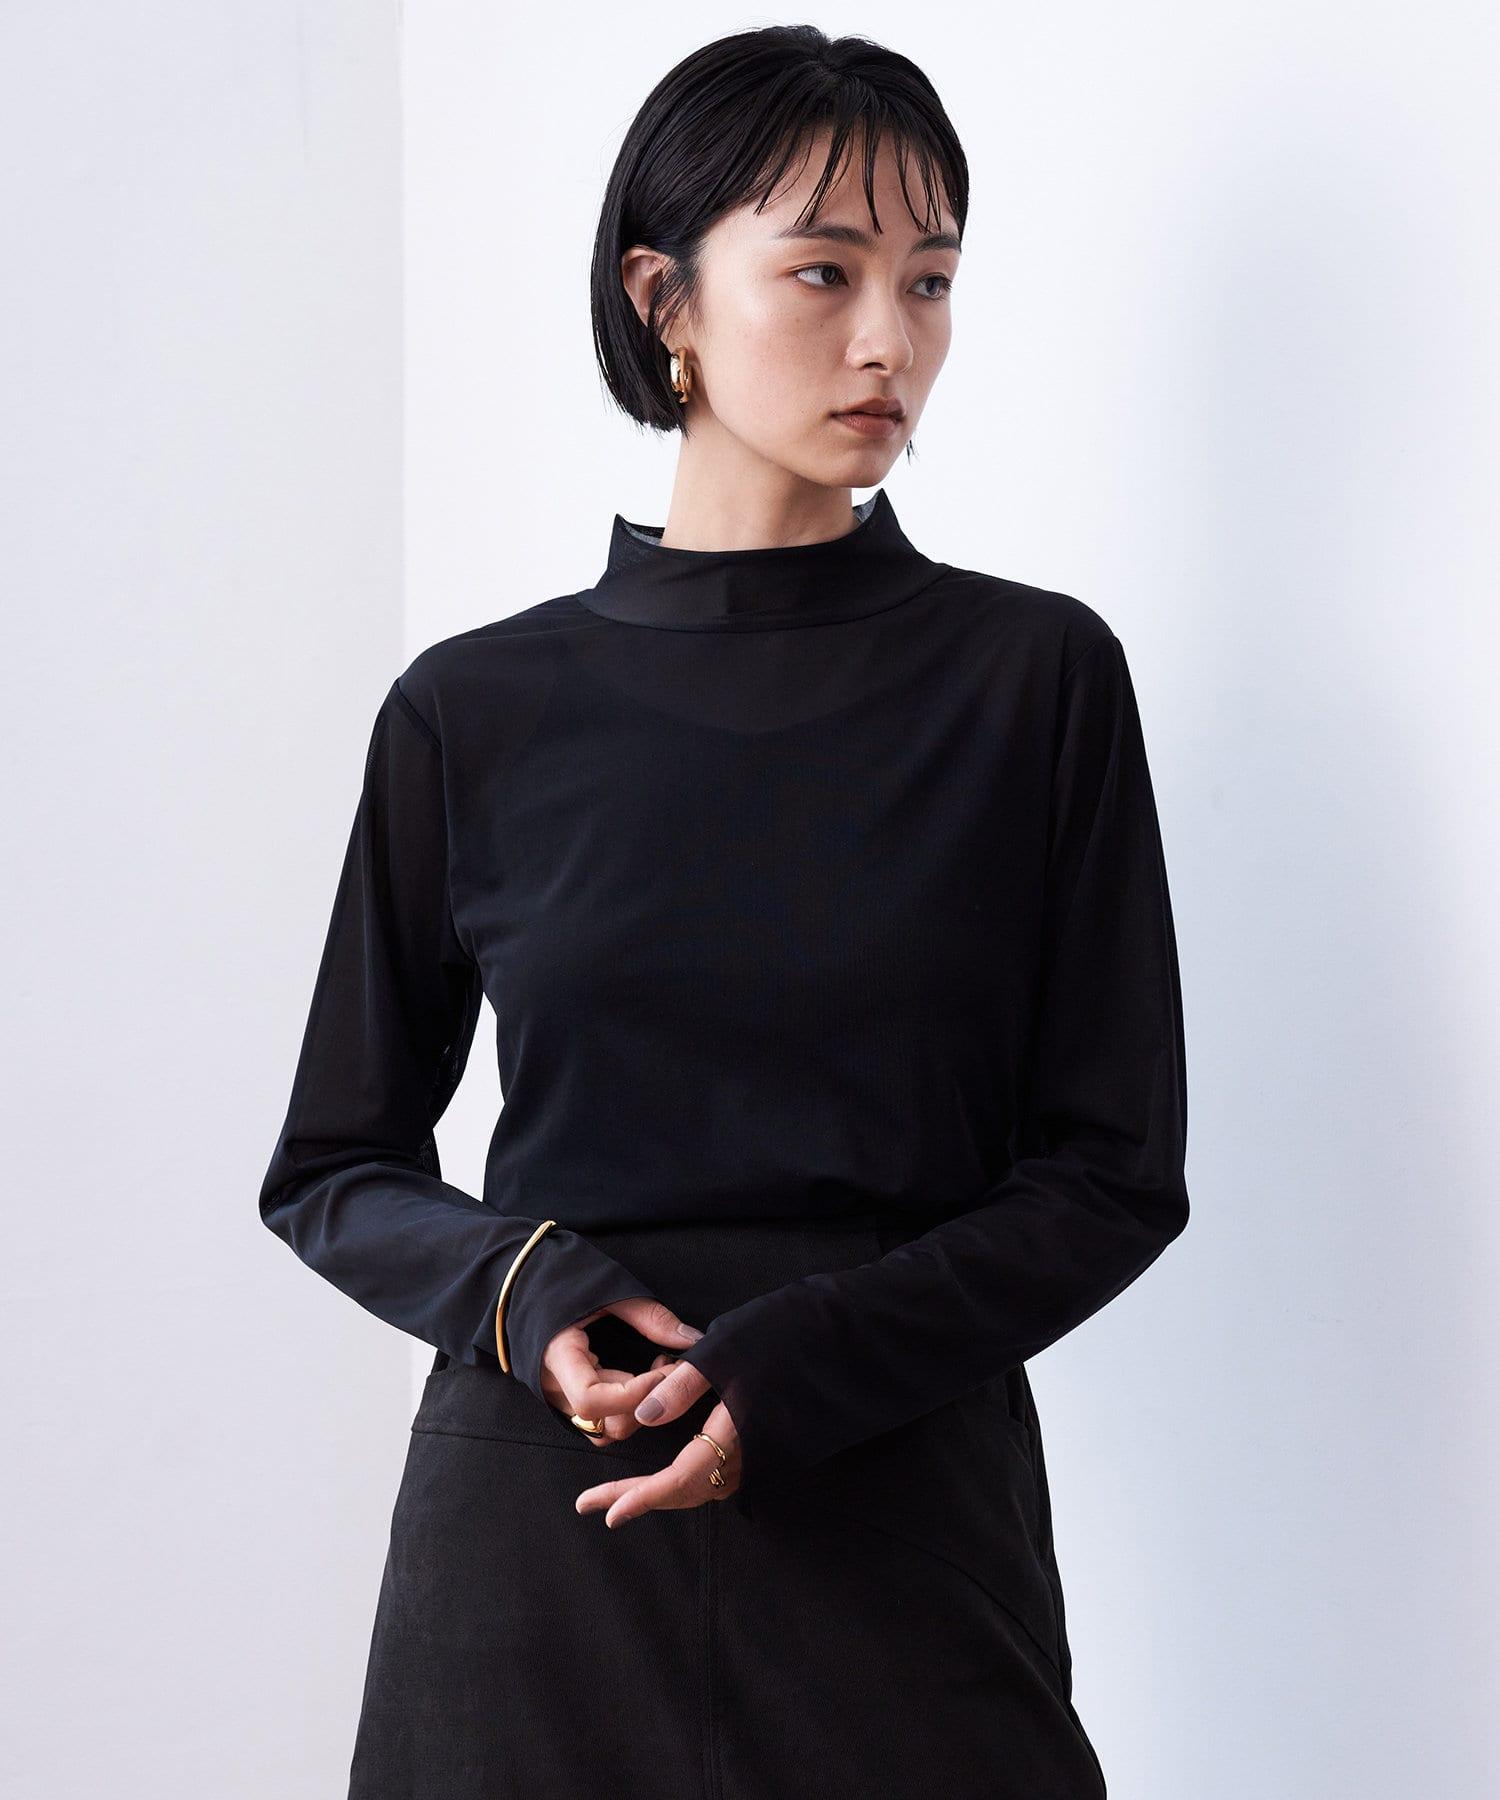 Loungedress(ラウンジドレス) レディース 【odore/オドル】シアータートルプルオーバー ブラック